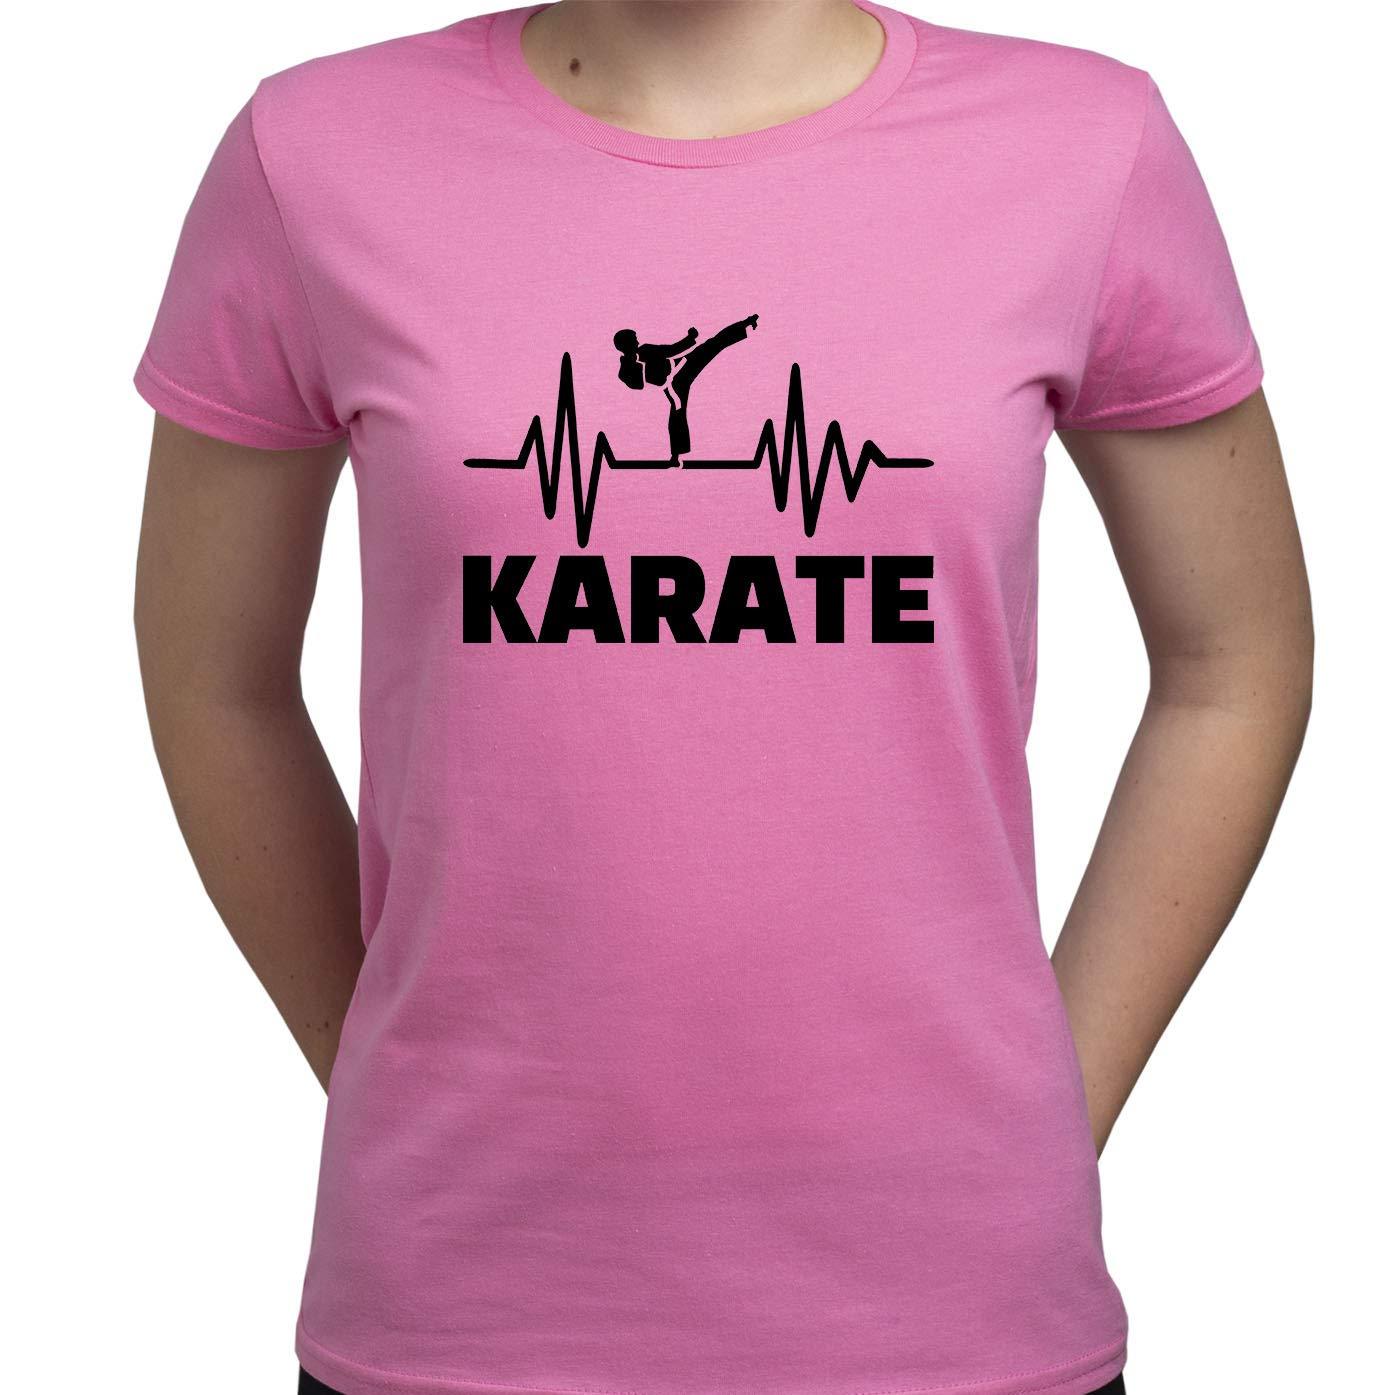 EUGINE DREAM Karate Shirt Karate Fan Tshirt Karate Gift T Shirt Karate Sport T-Shirt Donna